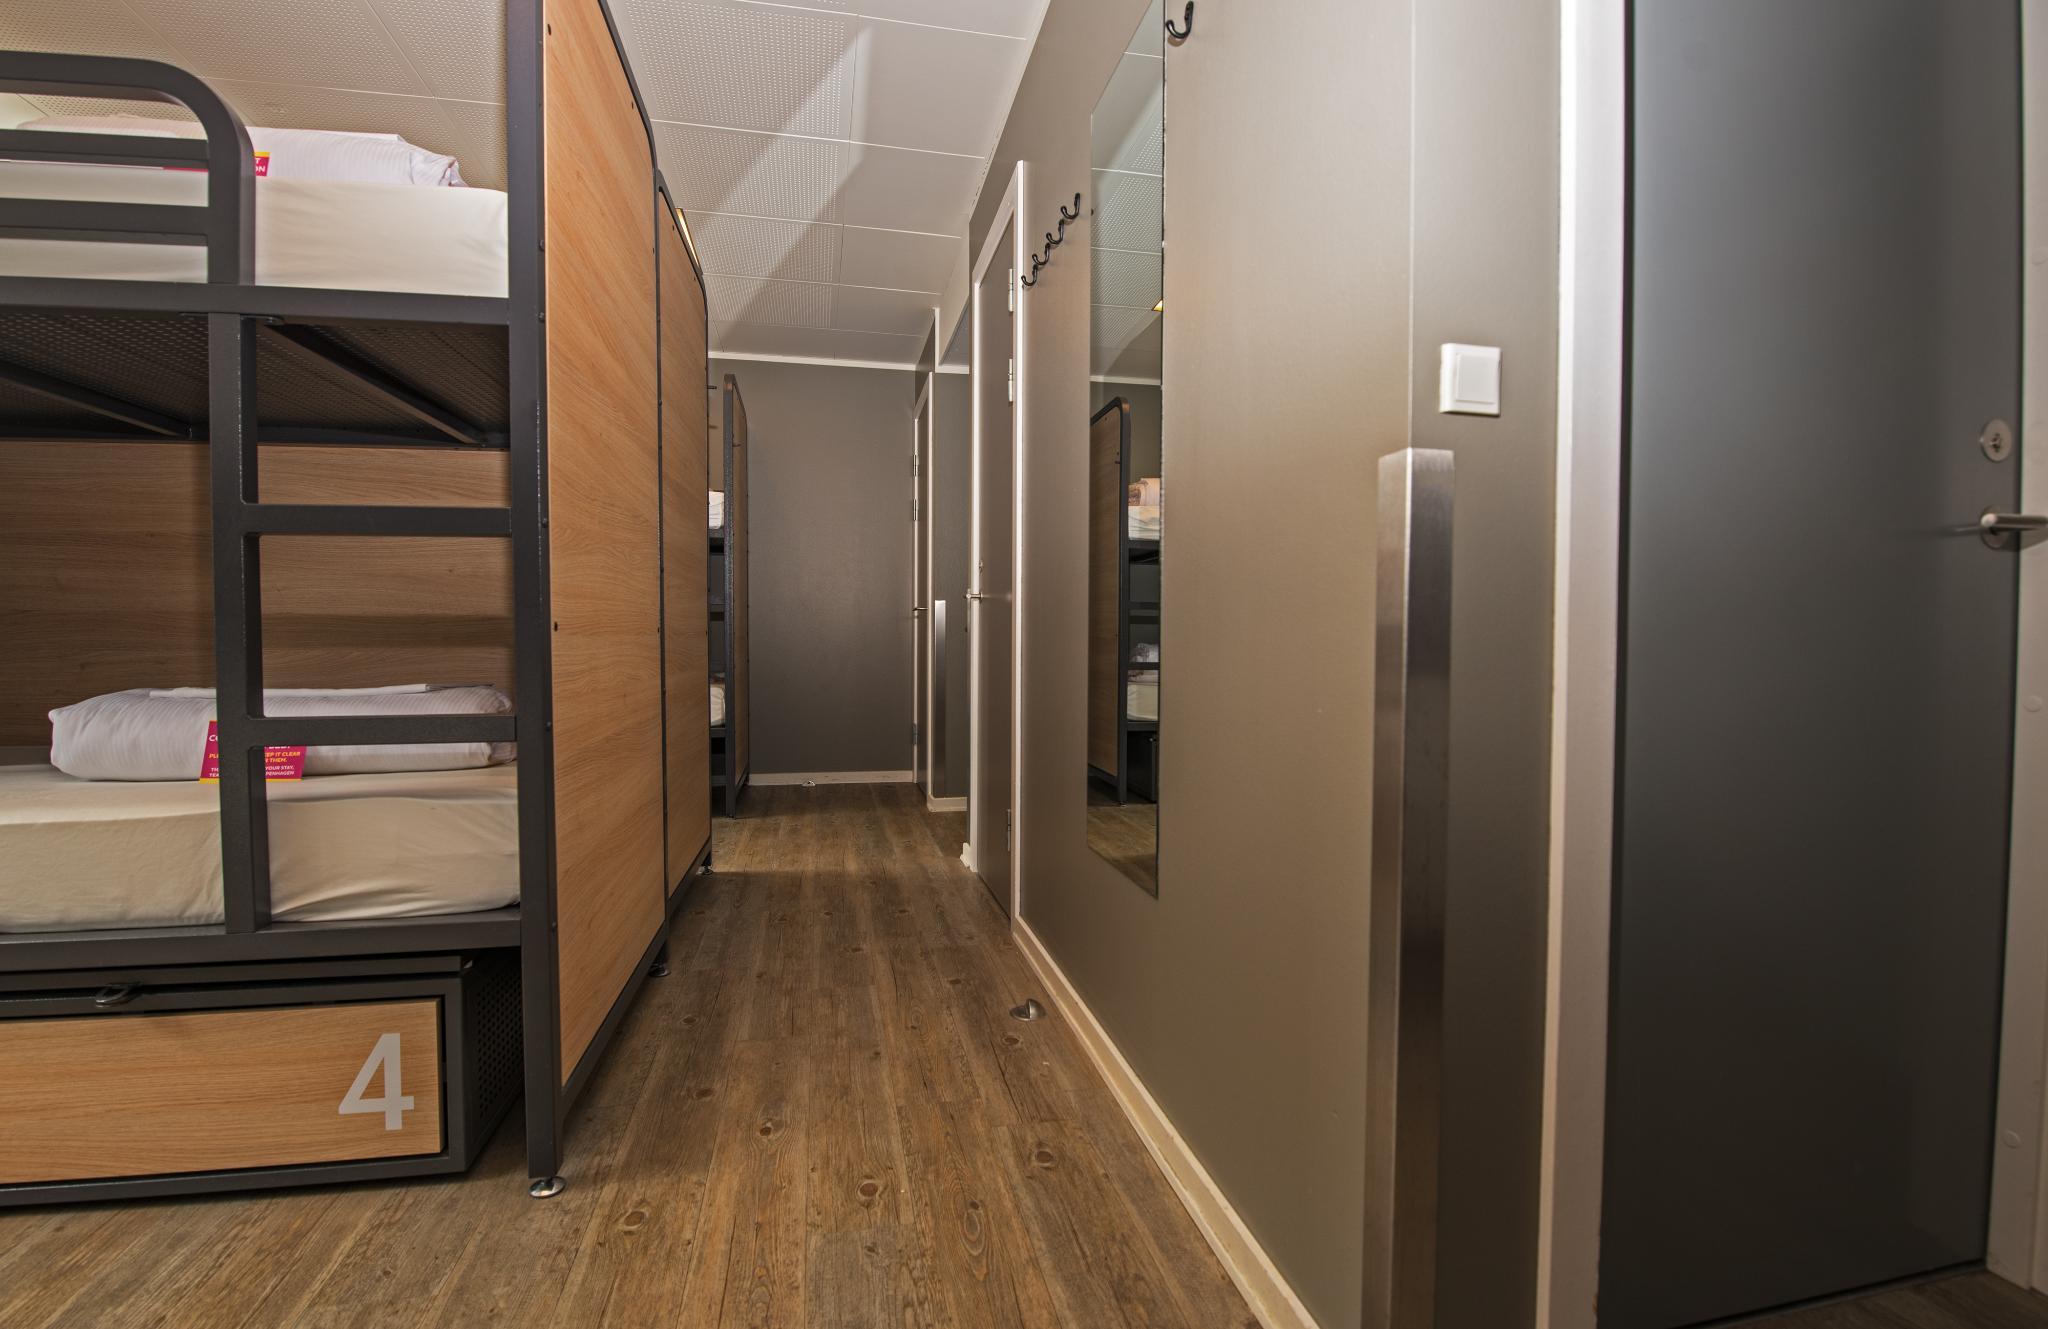 Bed in dormitory one bedroom